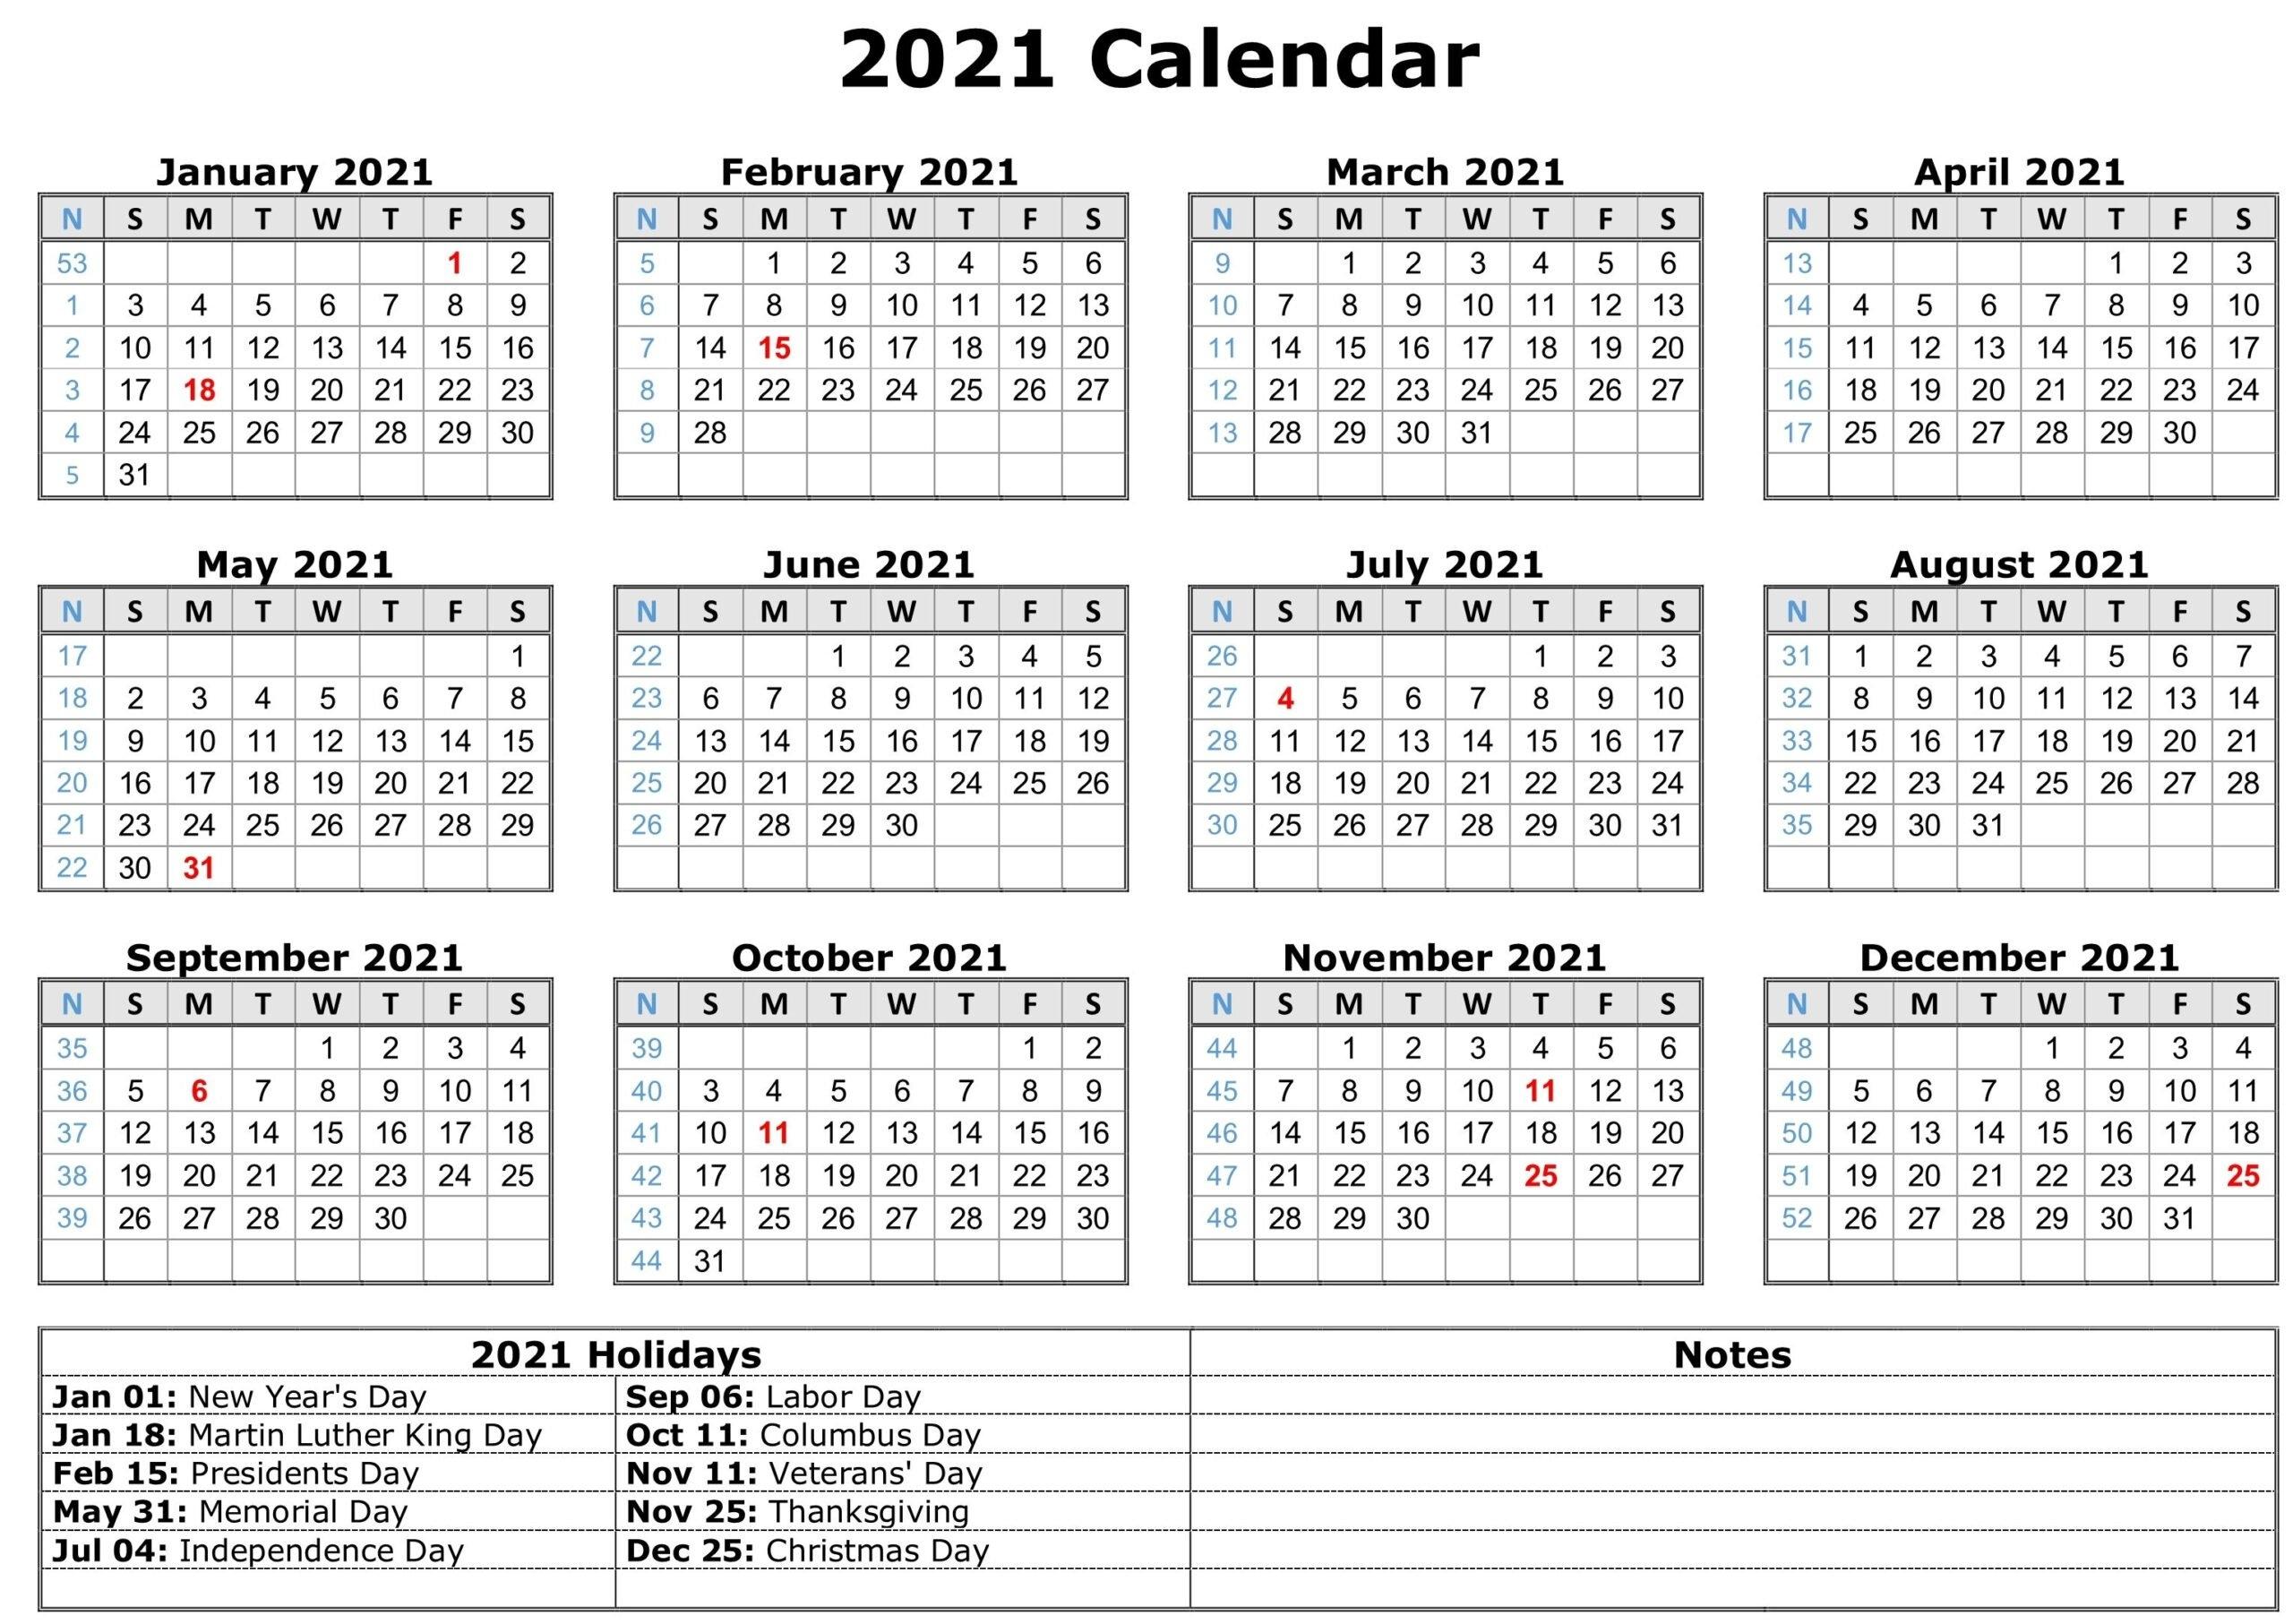 Online Free Printable Calendar 2021 | Calendar Printables Free Blank pertaining to Free Printable Calendars 2021 Monthly